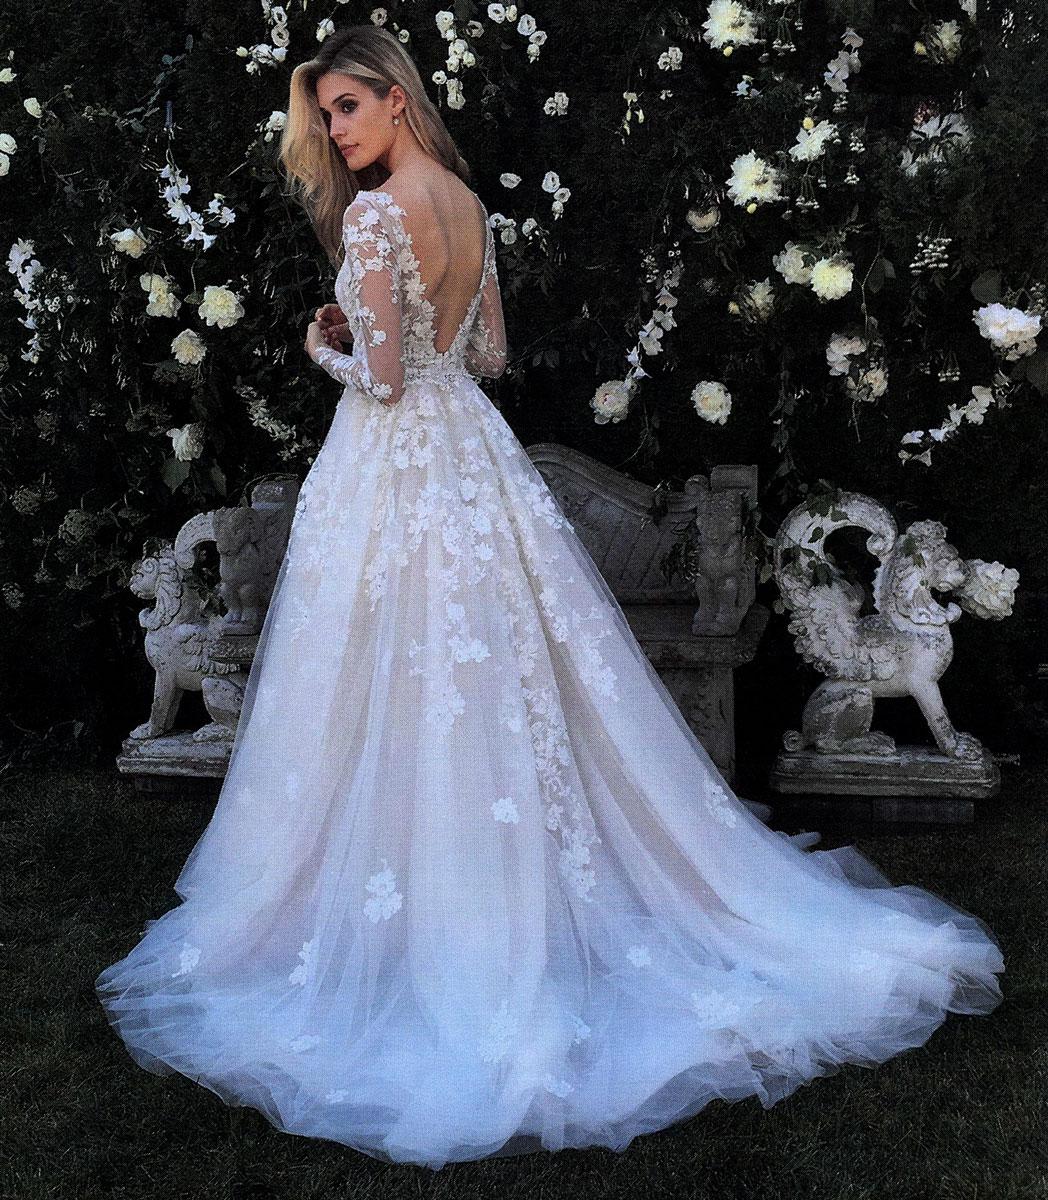 V-neck Long Sleeve Beaded Applique Wedding Dress | Kleinfeld Bridal